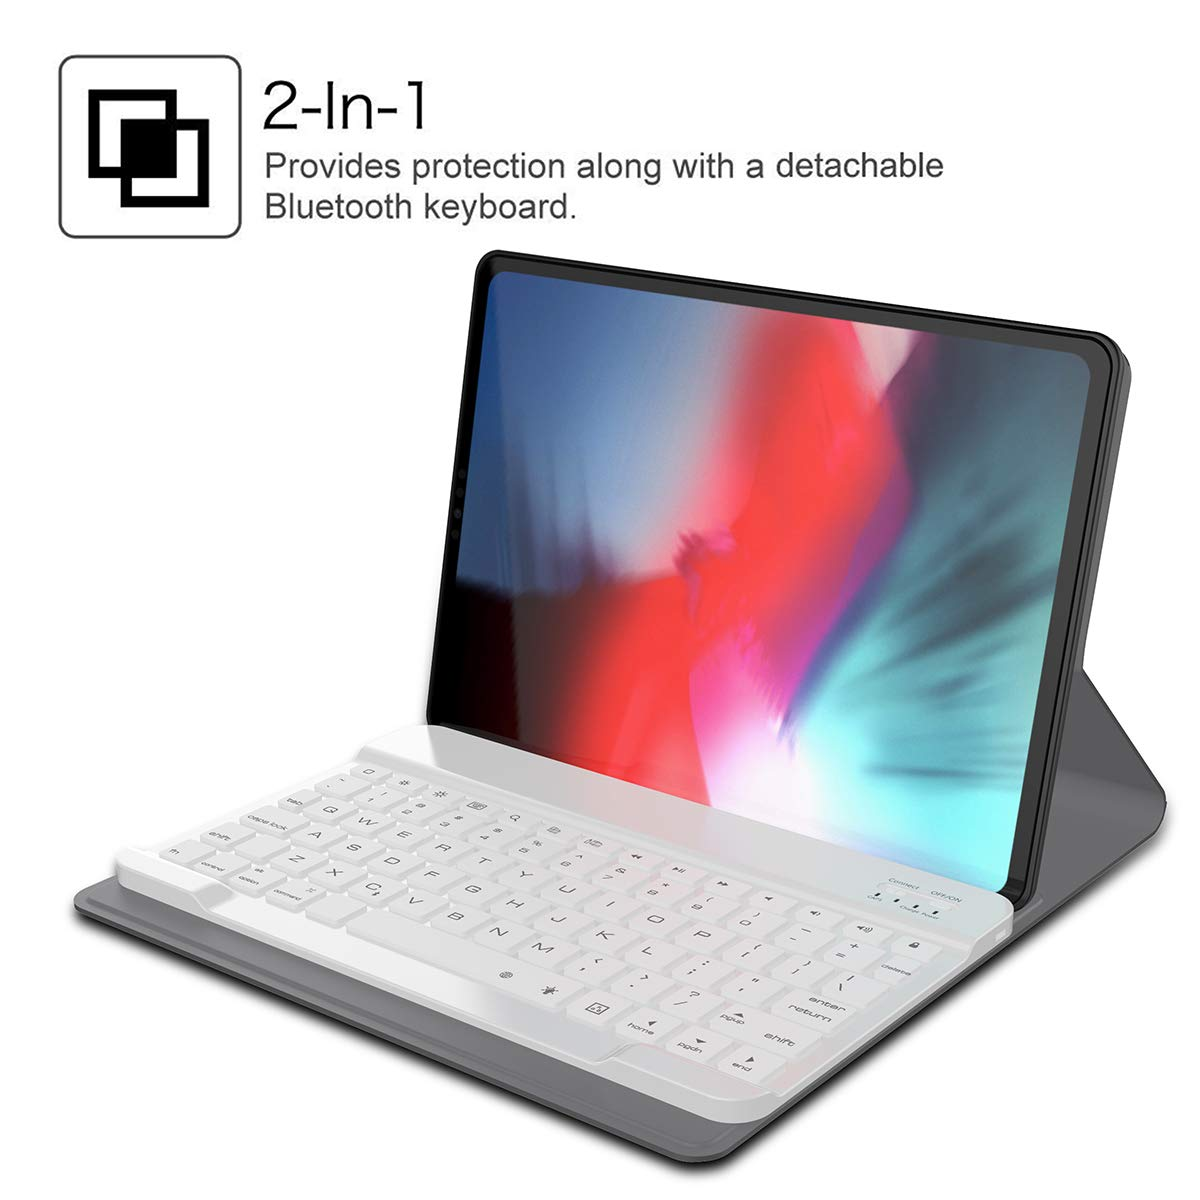 Amazon.com: iPad Pro 11 Inch Keyboard Case 2018 Fall New, Fusutonus - Detachable Tablet Shell Leather, Wireless Keyboard and Smart Case, Anti-Scratch Full ...